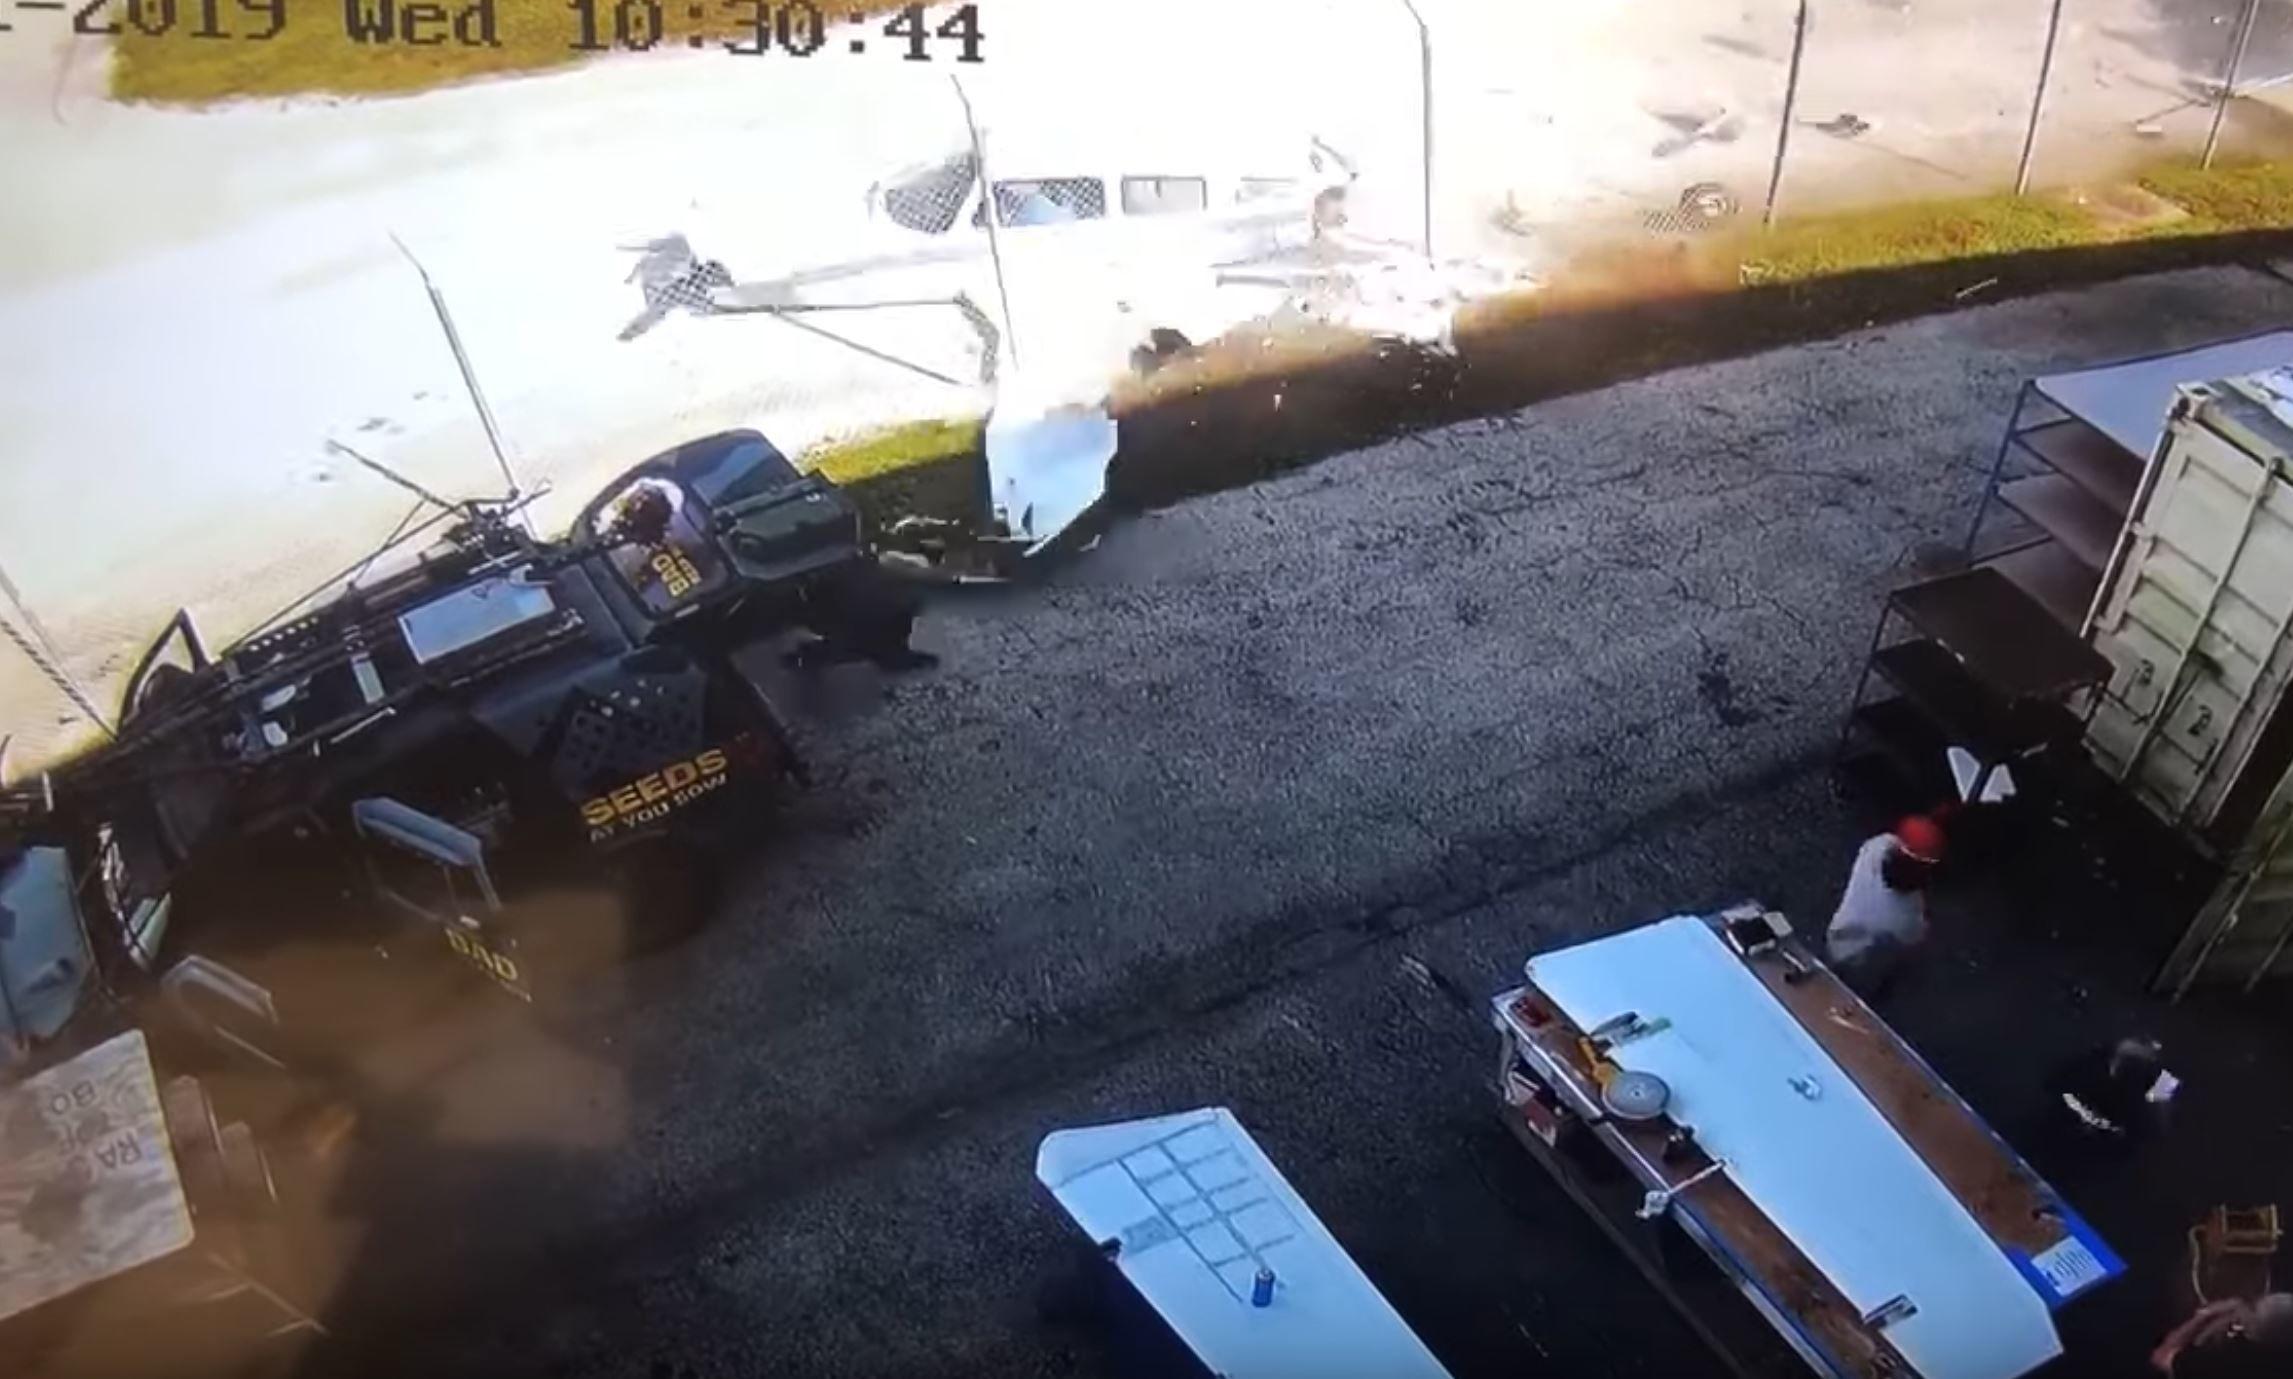 Momento exácto cuando la avioneta impacta contra la valla